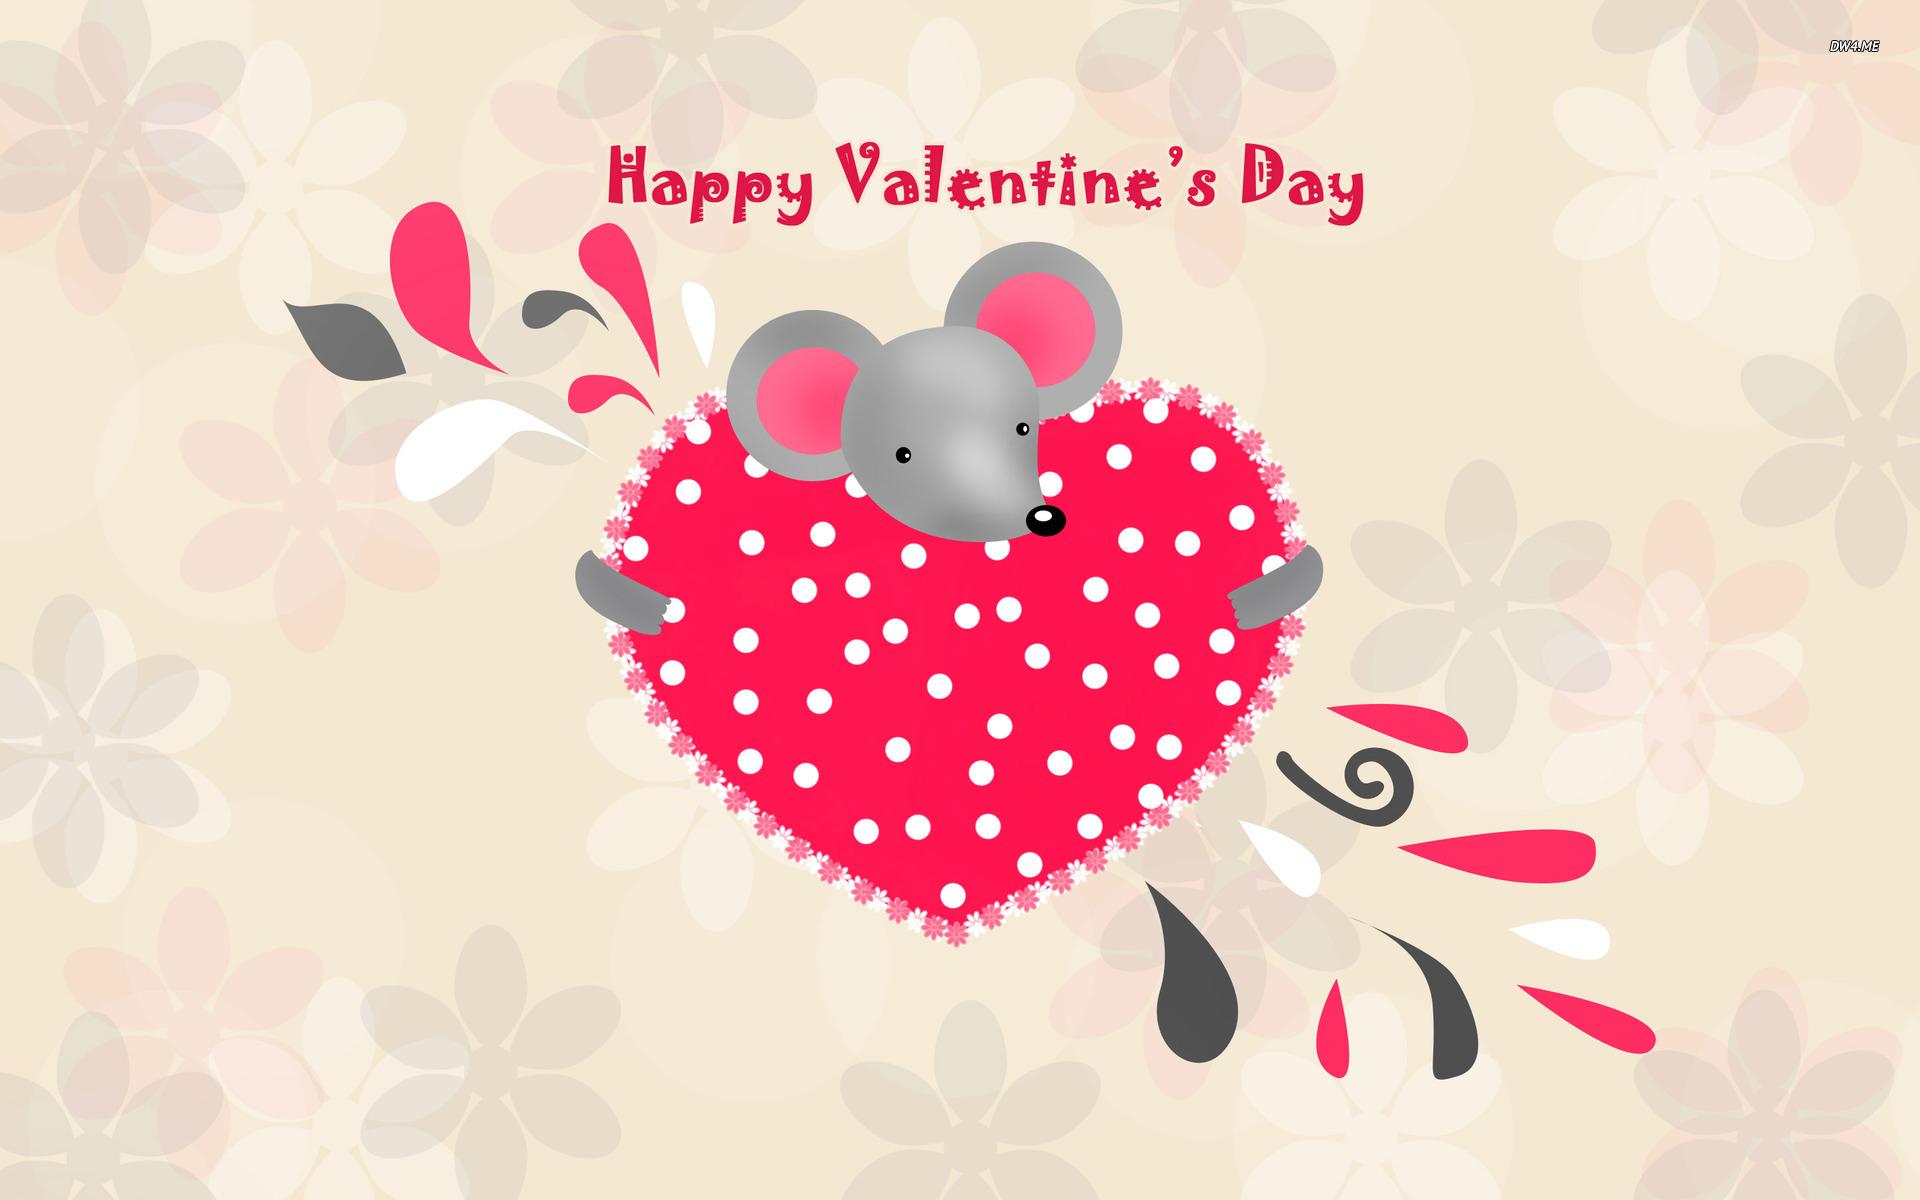 Happy Valentines Day wallpaper   798408 1920x1200